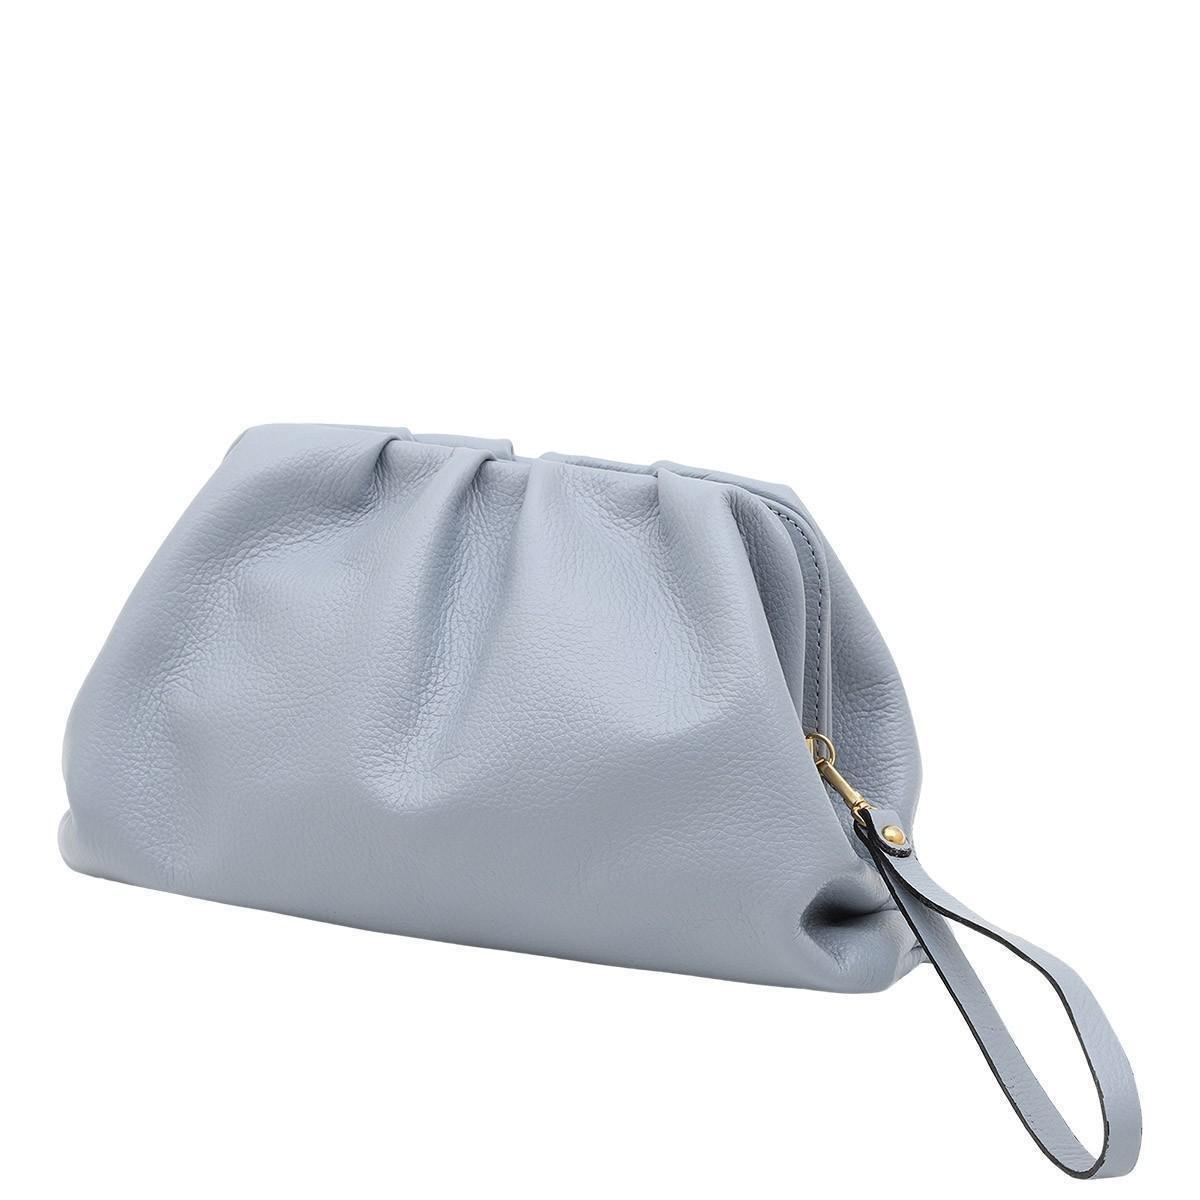 Bolsa Couro Mariart Carteira Clutch Mini Mari Feminina - Azul Claro